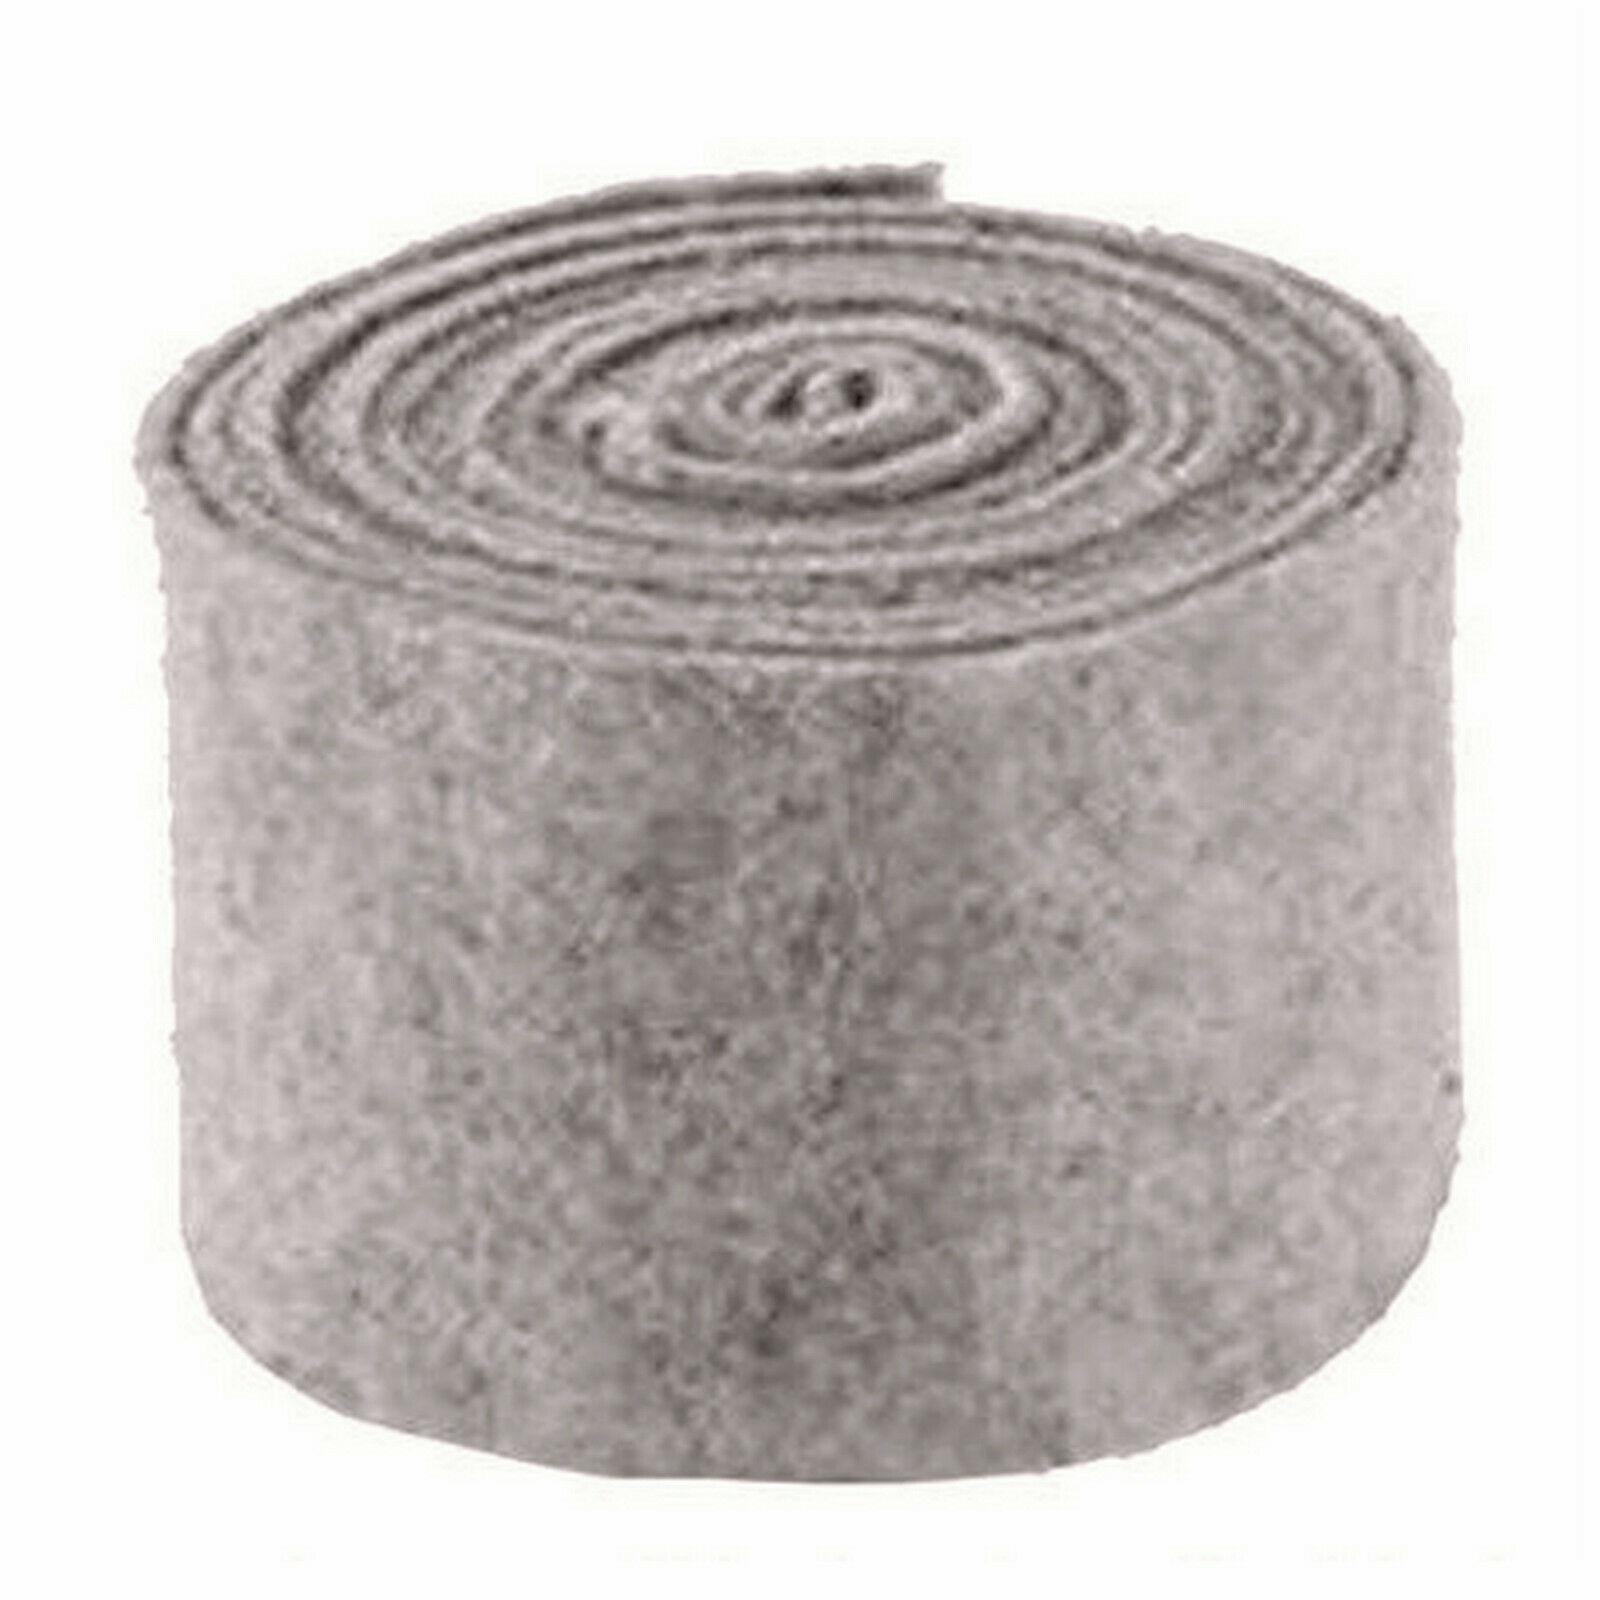 Topfband Filz 5 m x 15 cm Dekoband Wollvlies Filzband Wollband Schafwolle Bastel - Grau